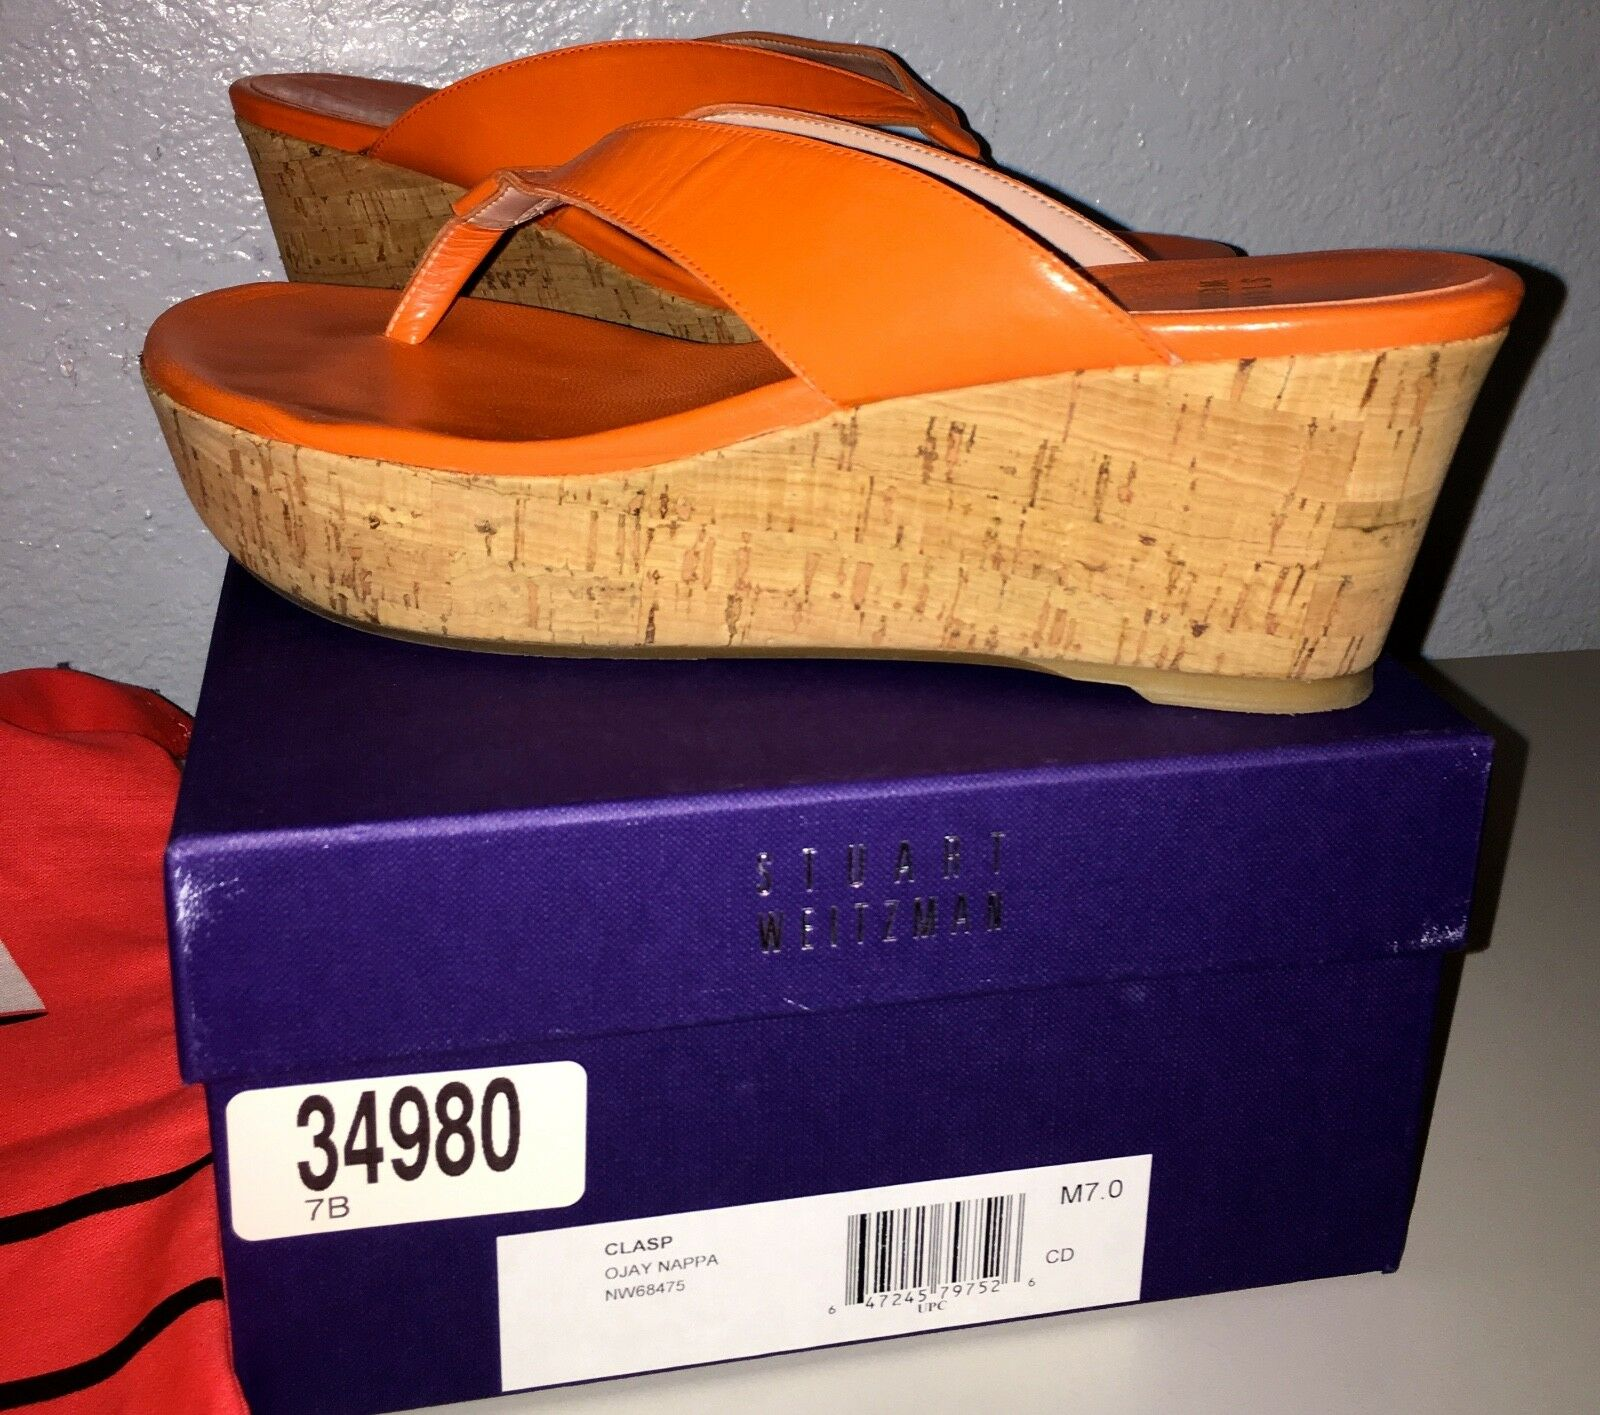 STUART WEITZMAN Clasp Ojay Nappa Wedges NW68475 Größe 7 B Original Box & Schuhe Bag